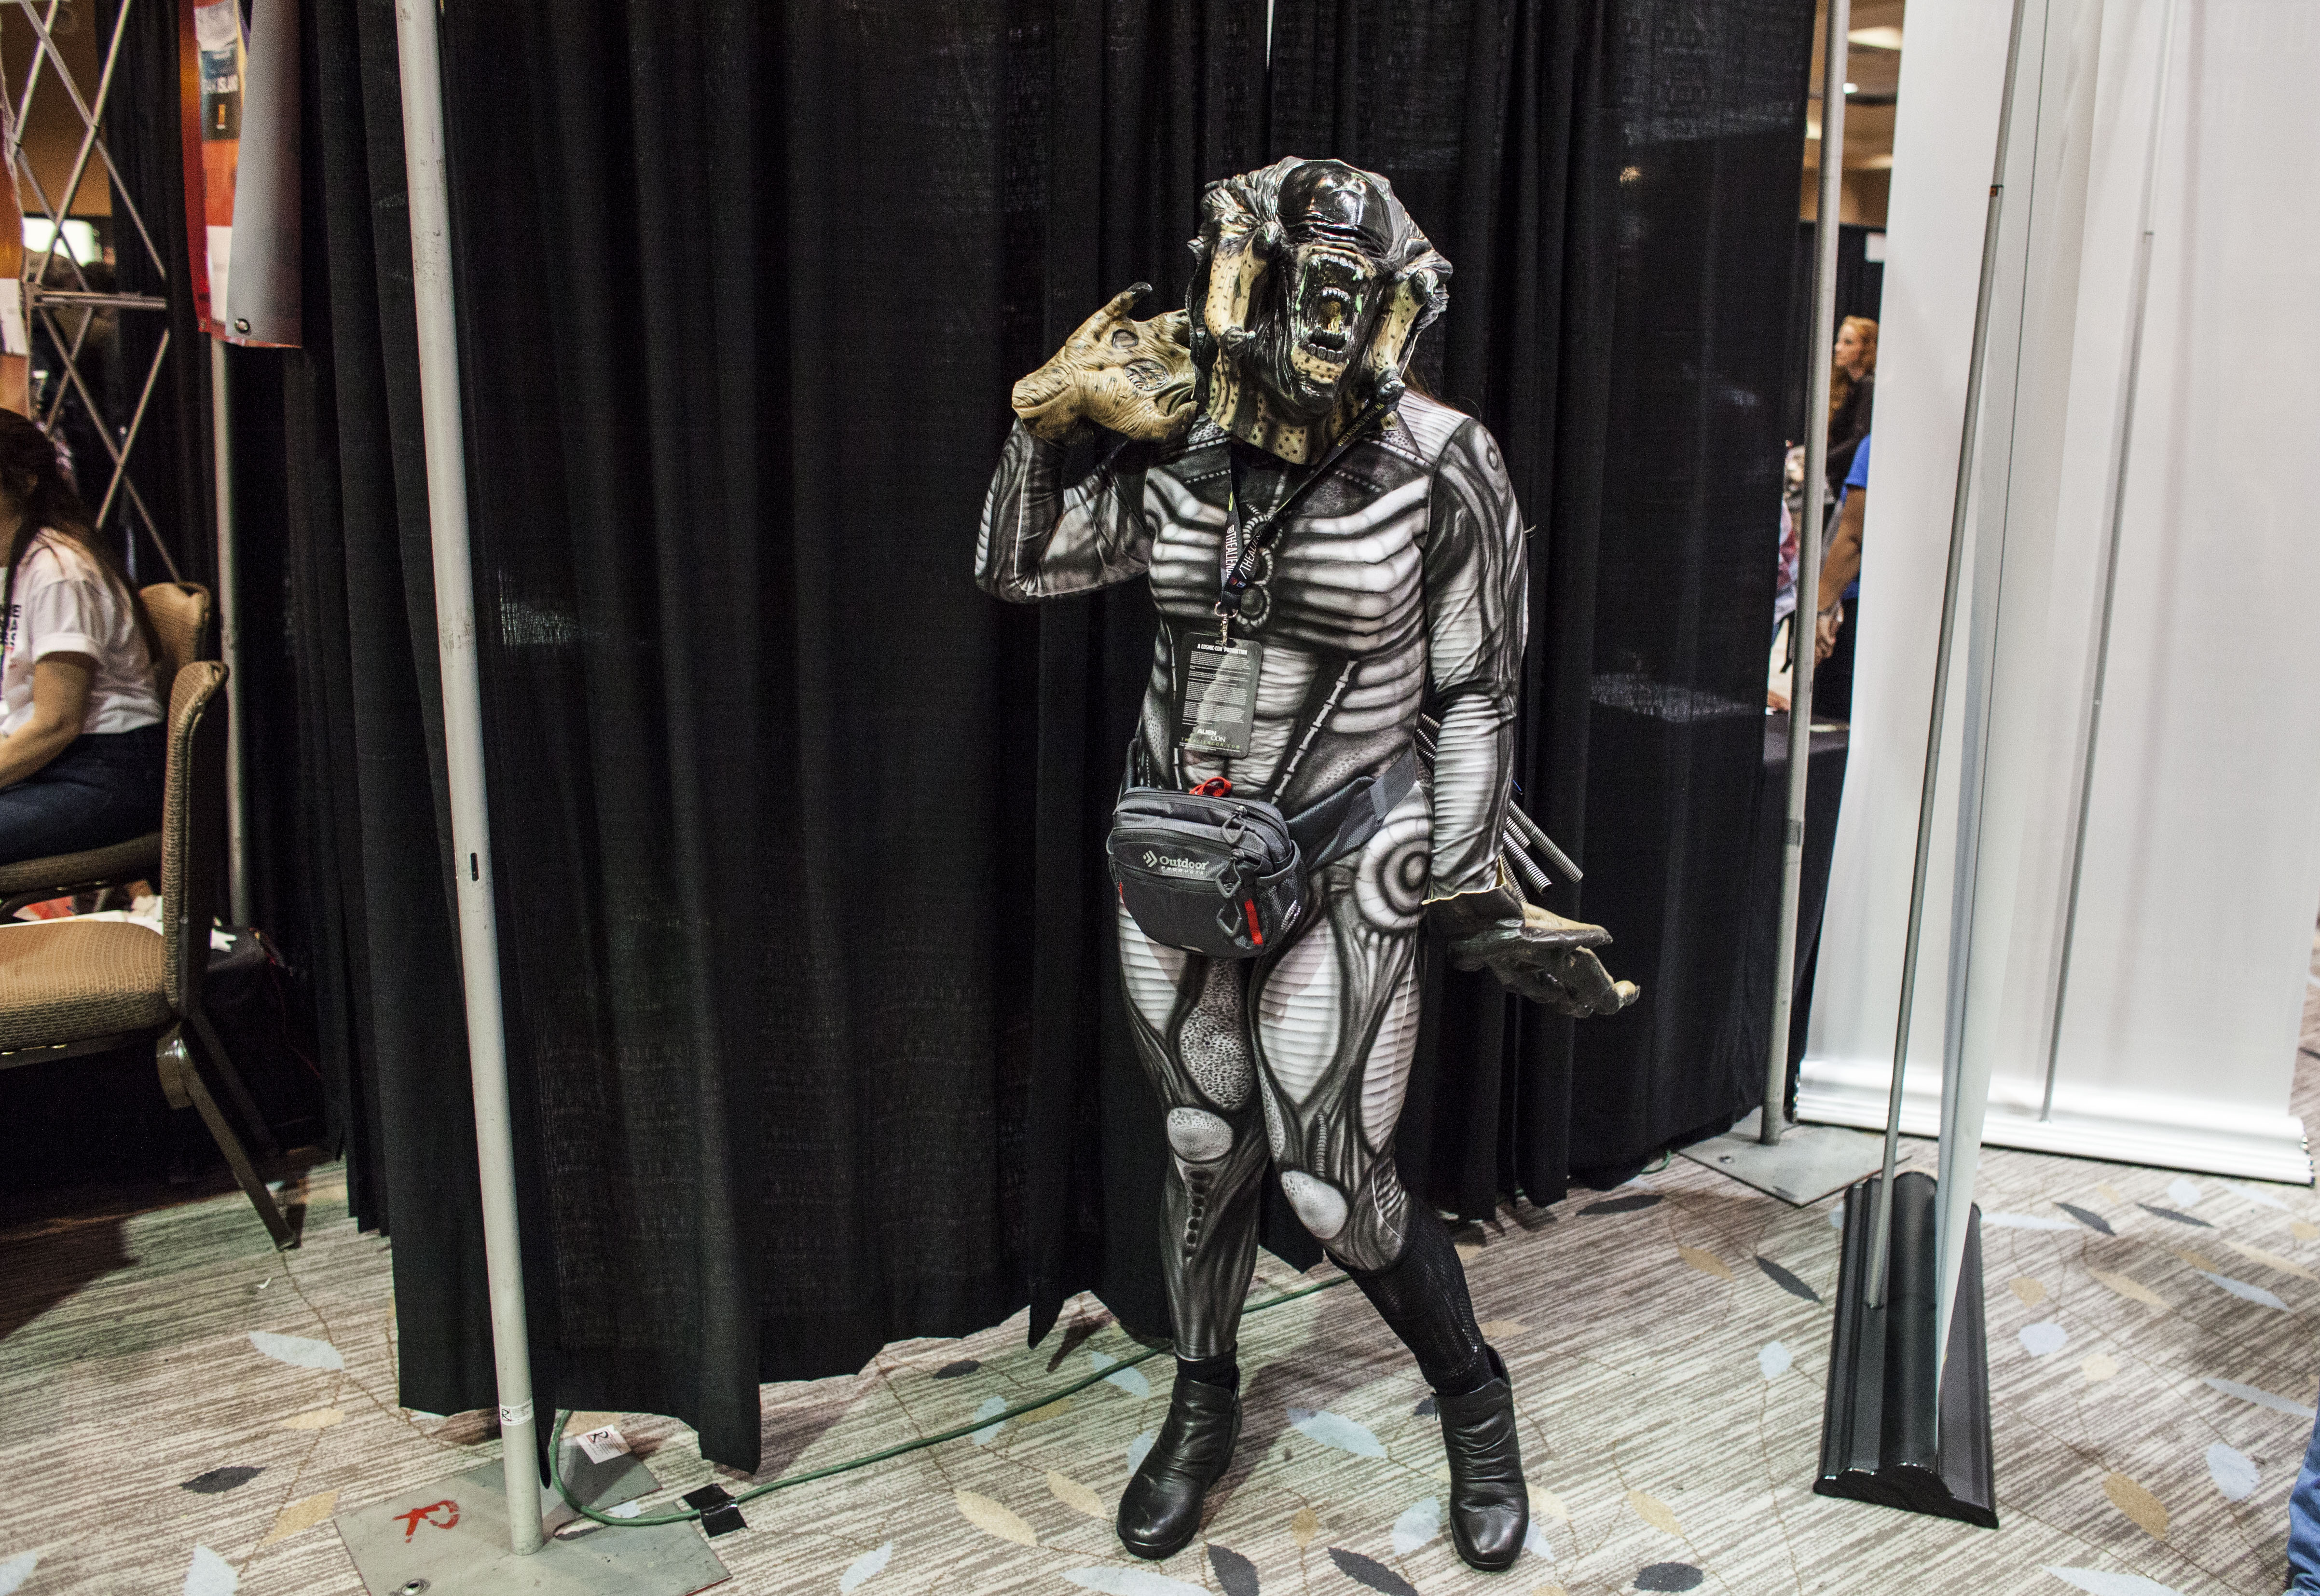 Extraterrestrials Invade California! Alien Con 2016 in Photos